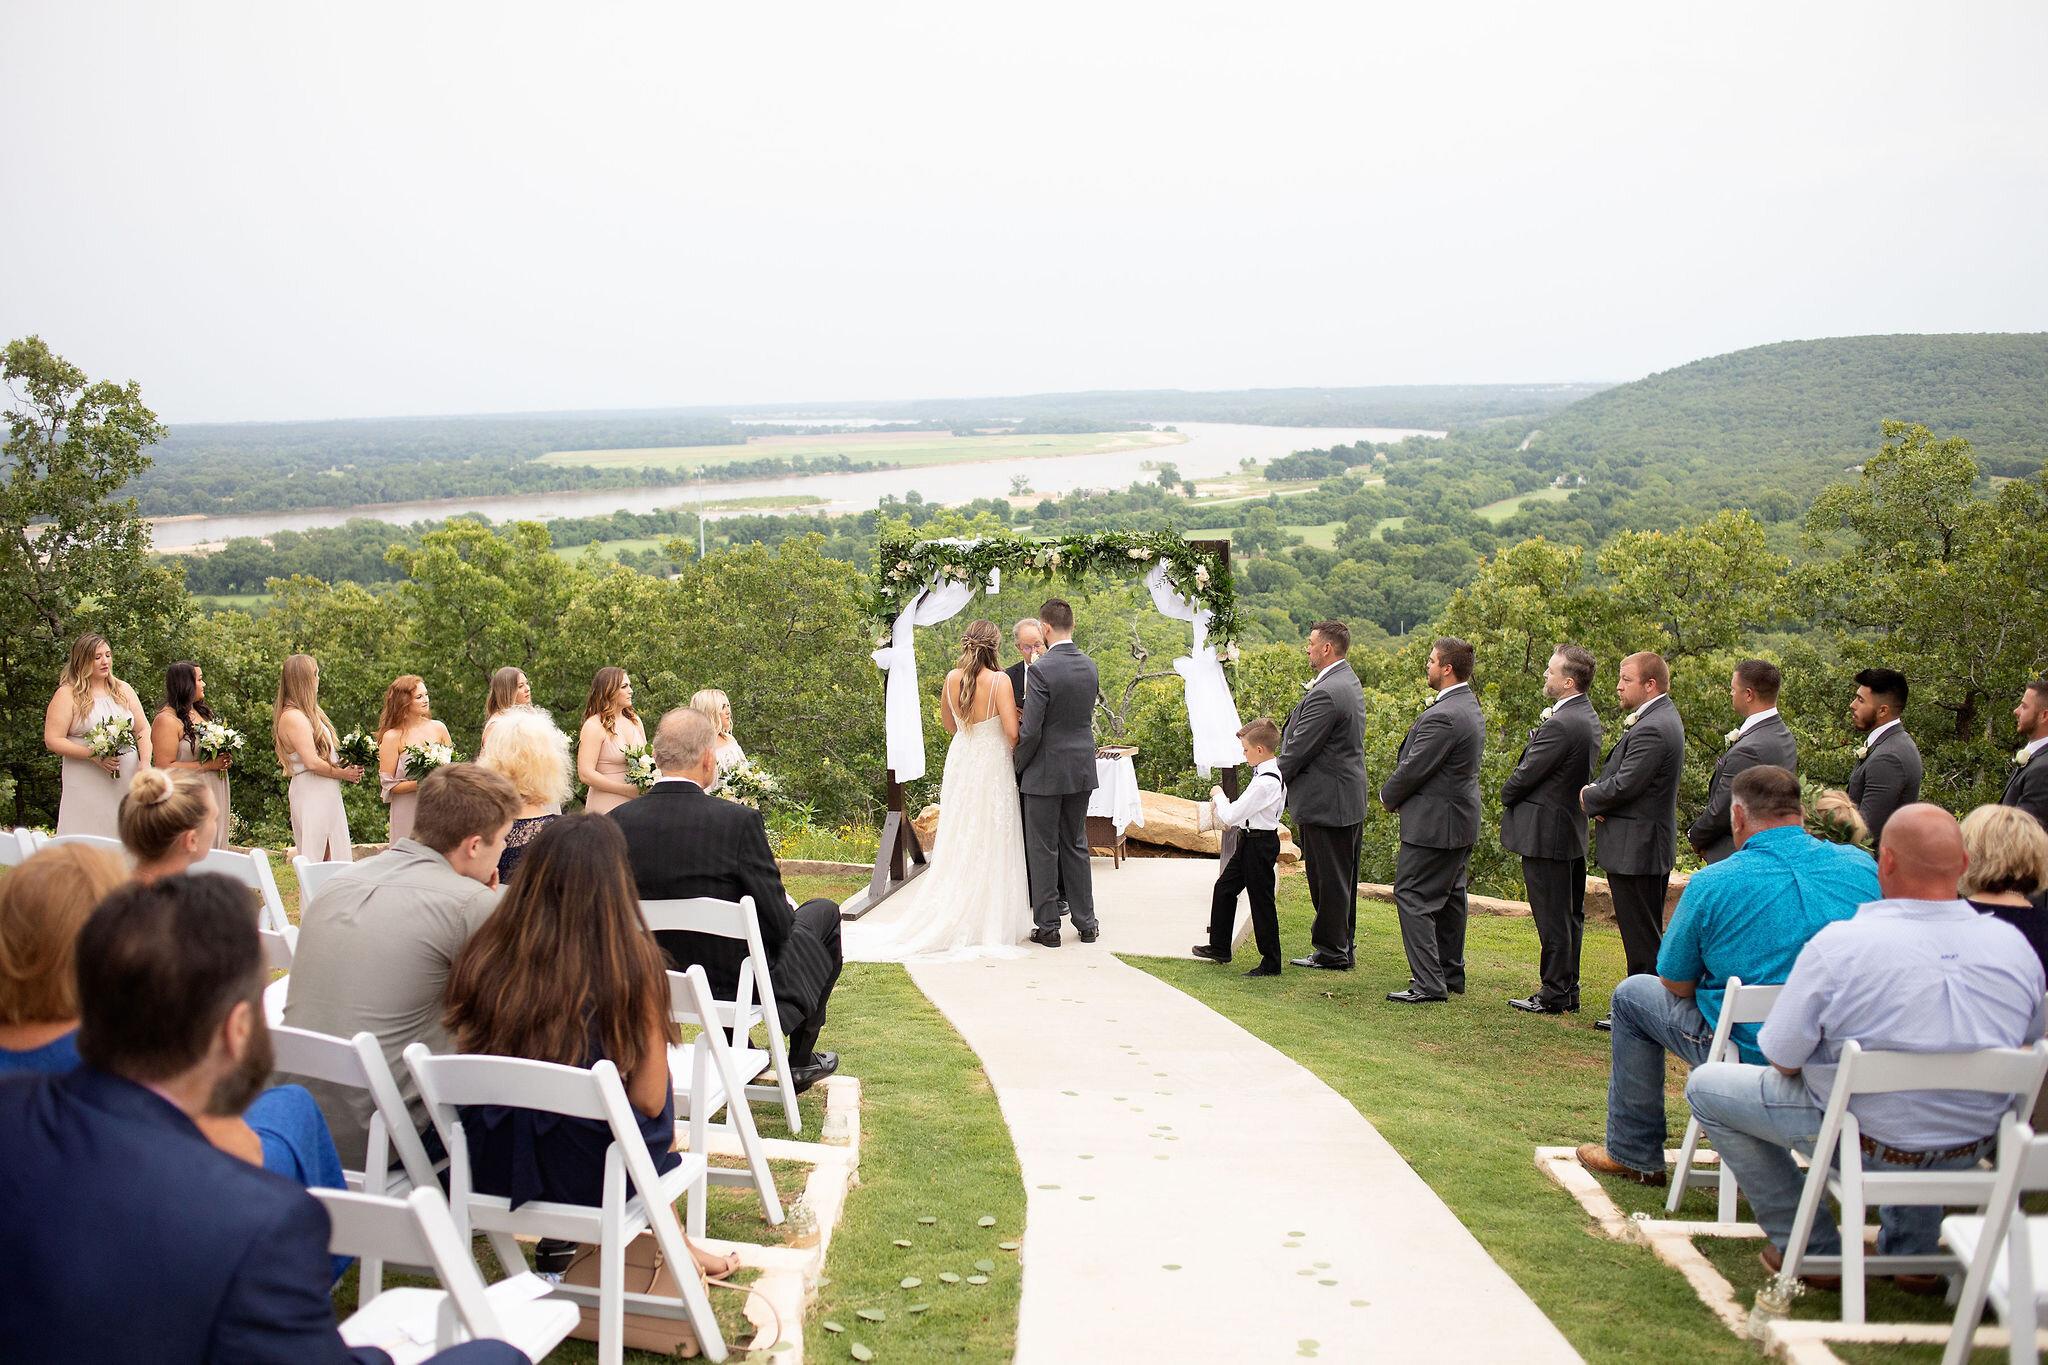 Oklahoma Summer Wedding Venue Dream Point Ranch 32.jpg